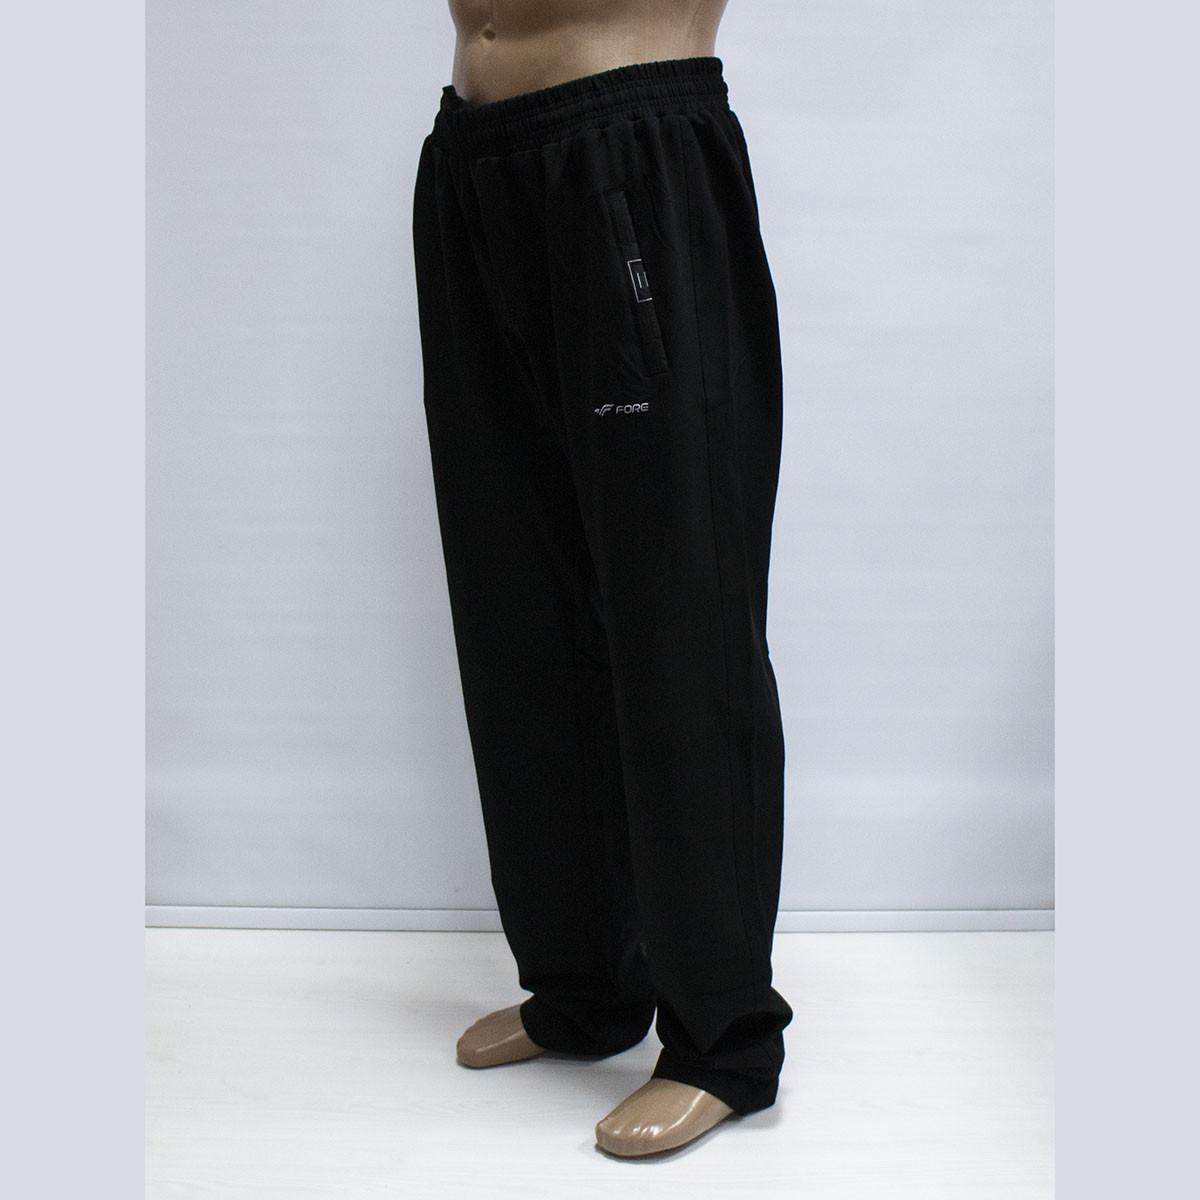 Спортивные штаны мужские большого размера Баталы тм. FORE 9542G